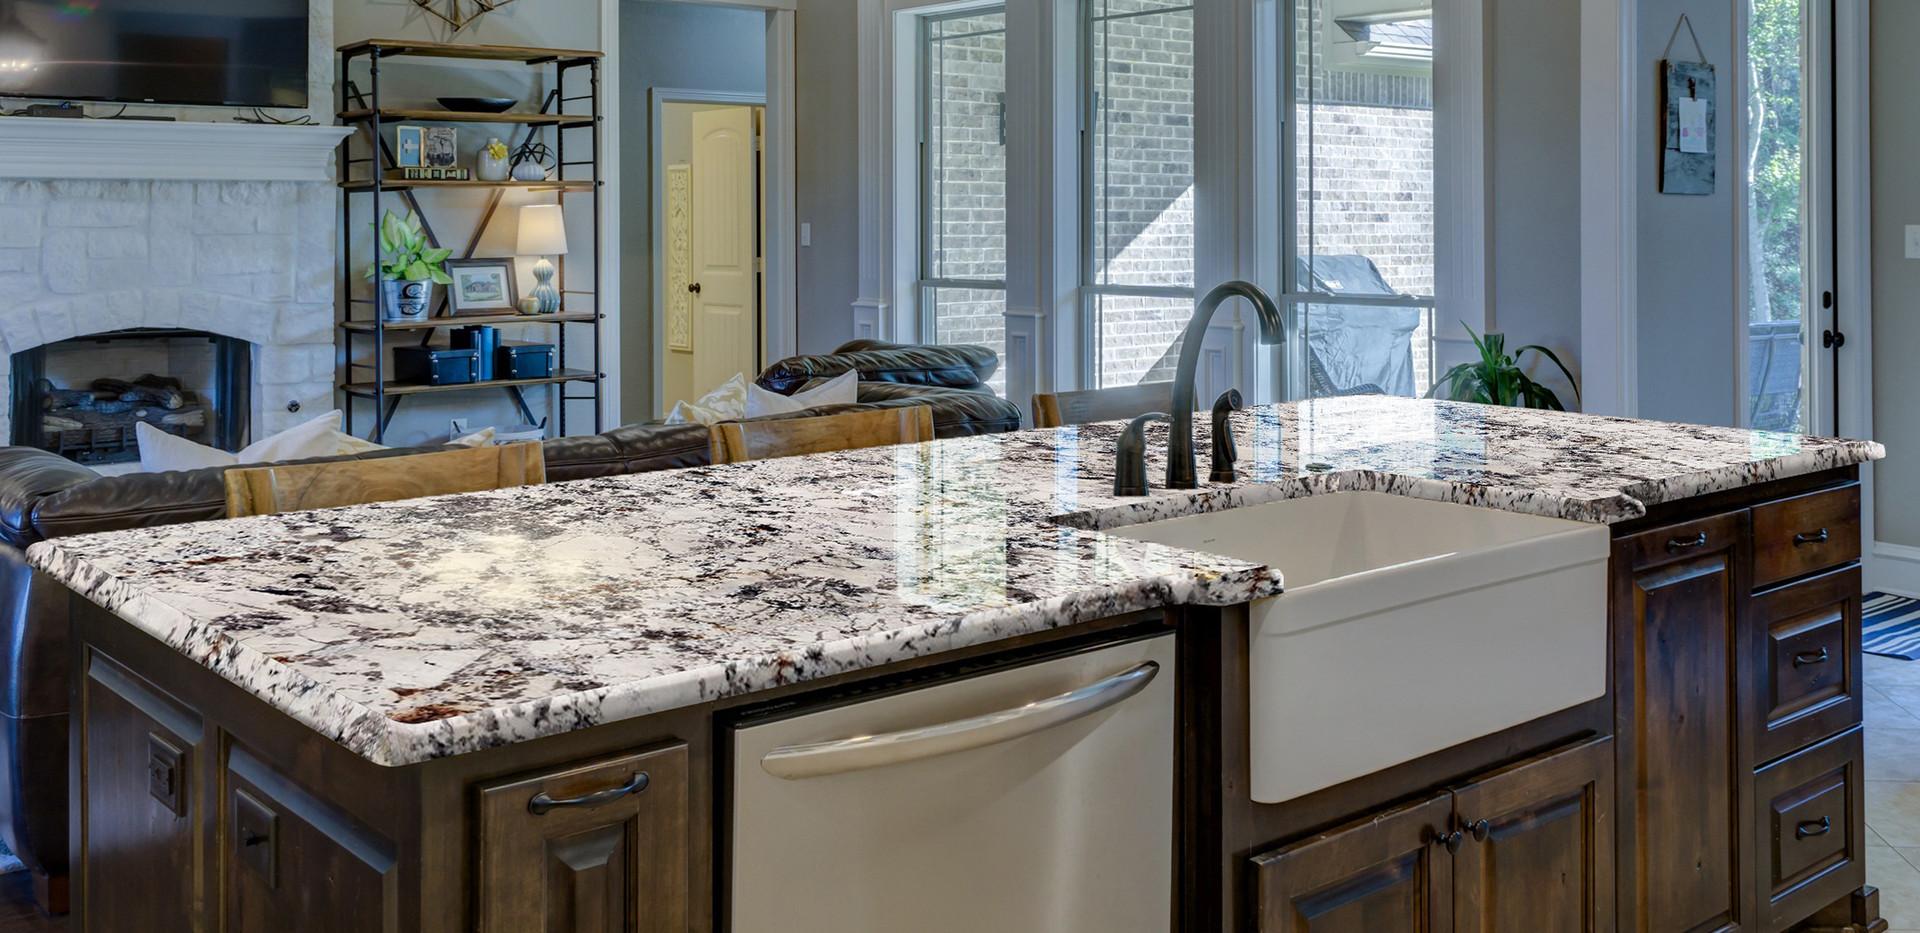 Blanc du Blanc granite kitchen countertop